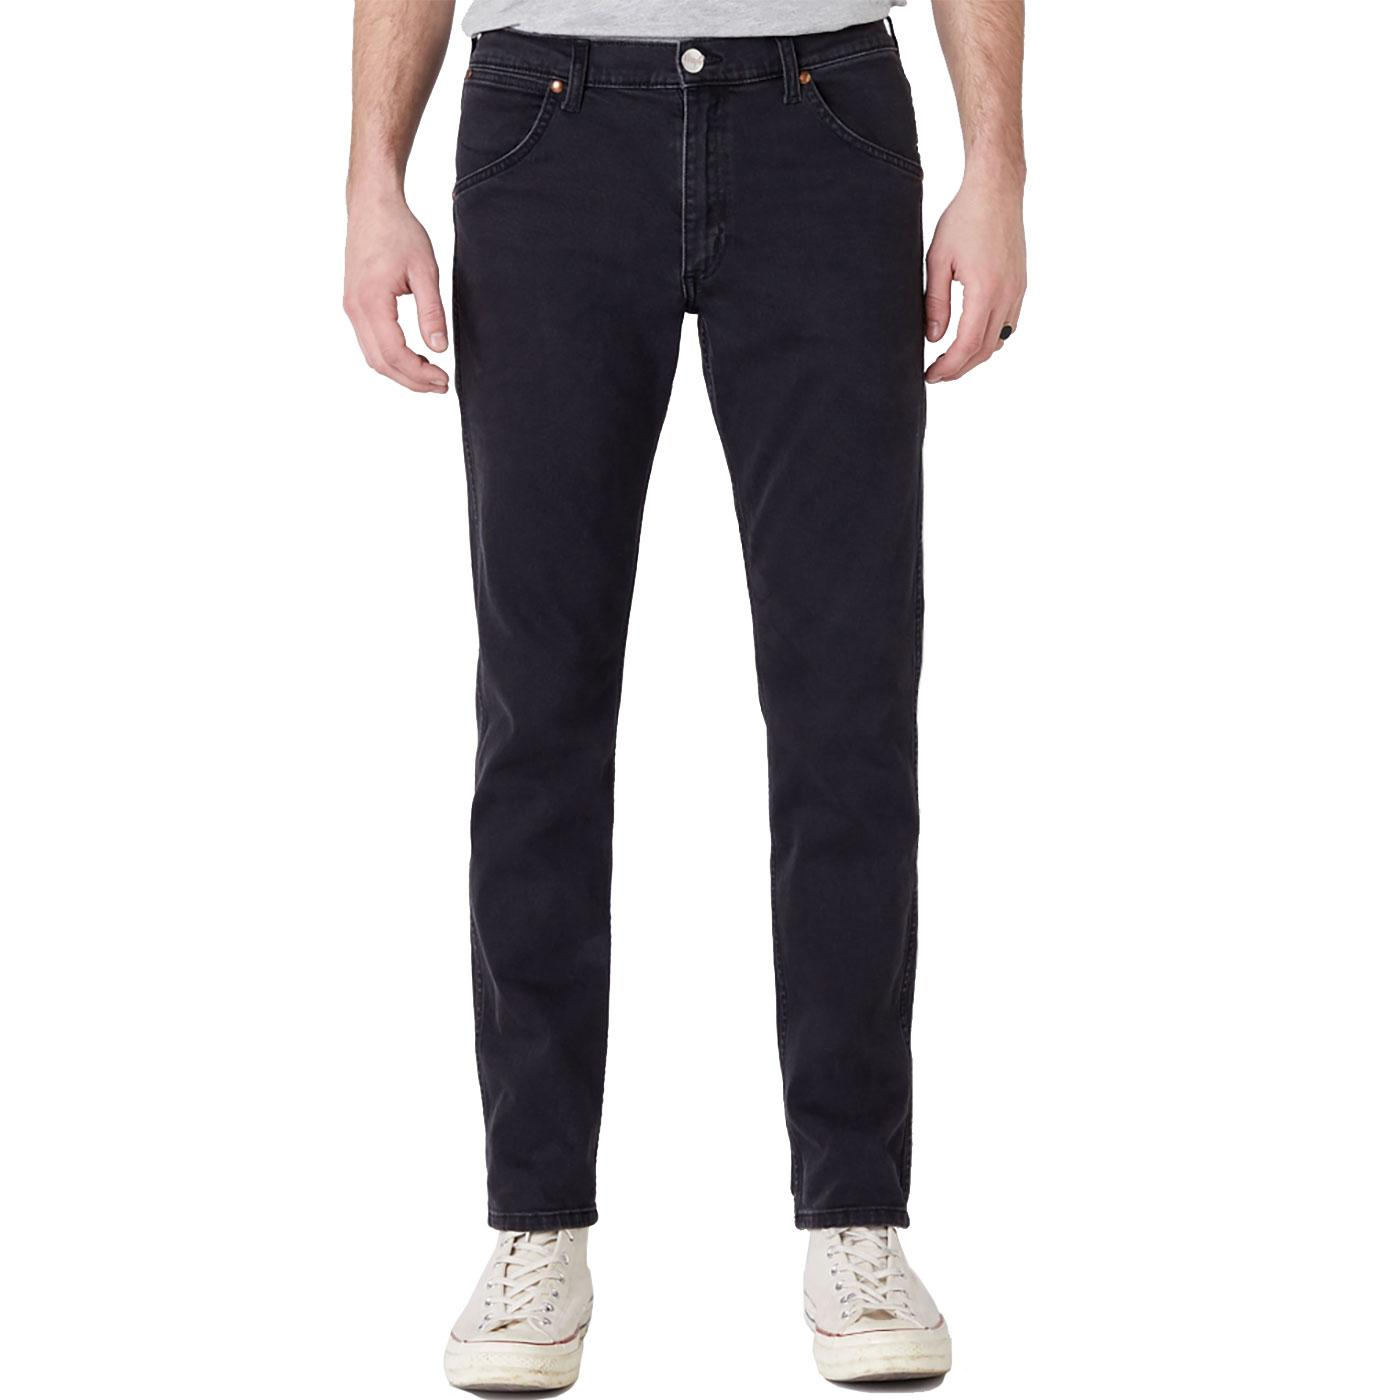 WRANGLER 11MWZ Indigood Icons Retro Slim Jeans